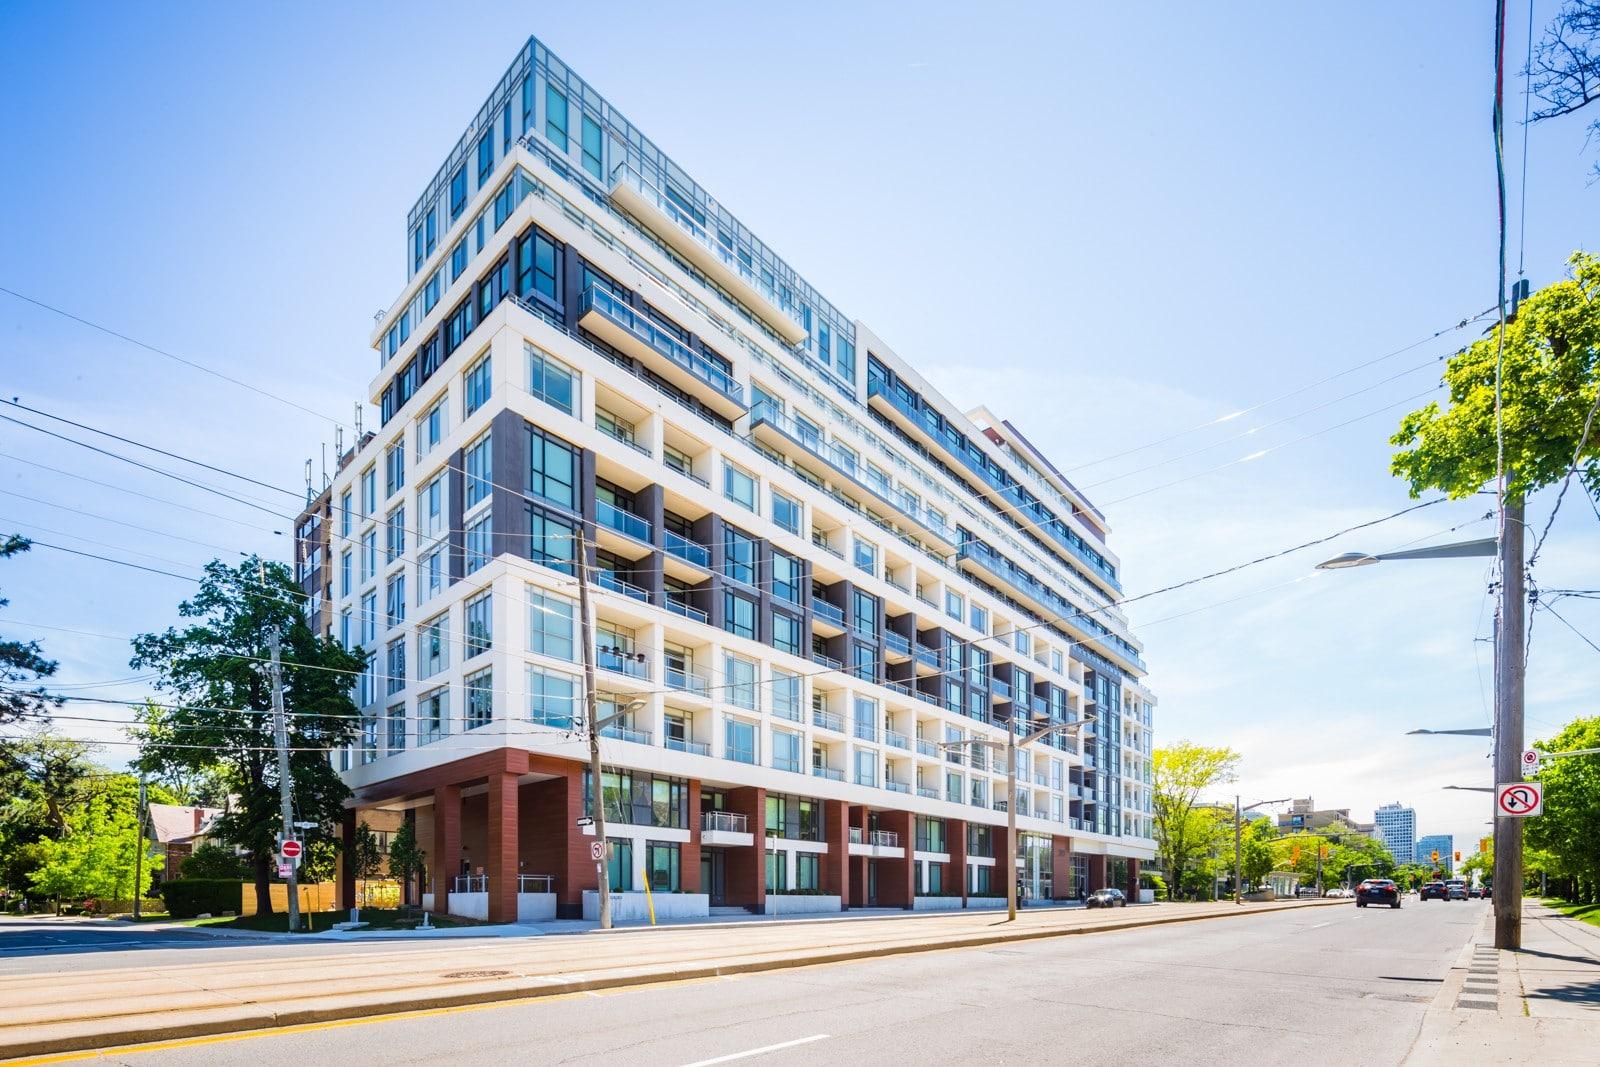 223 St.Clair Ave W – 2 Bed/2 Bath $2,400